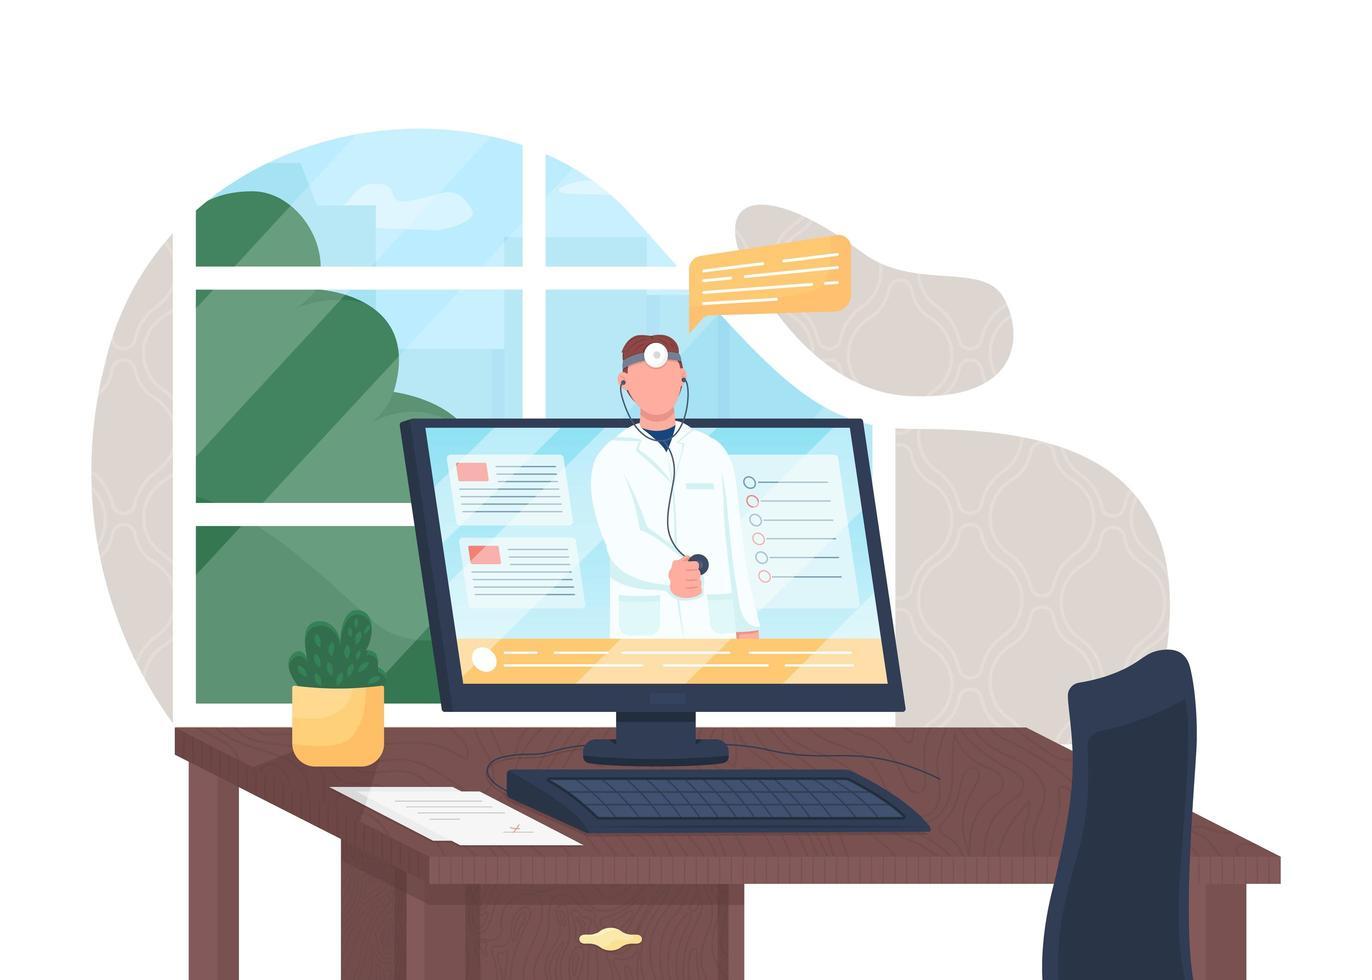 médico online na tela vetor